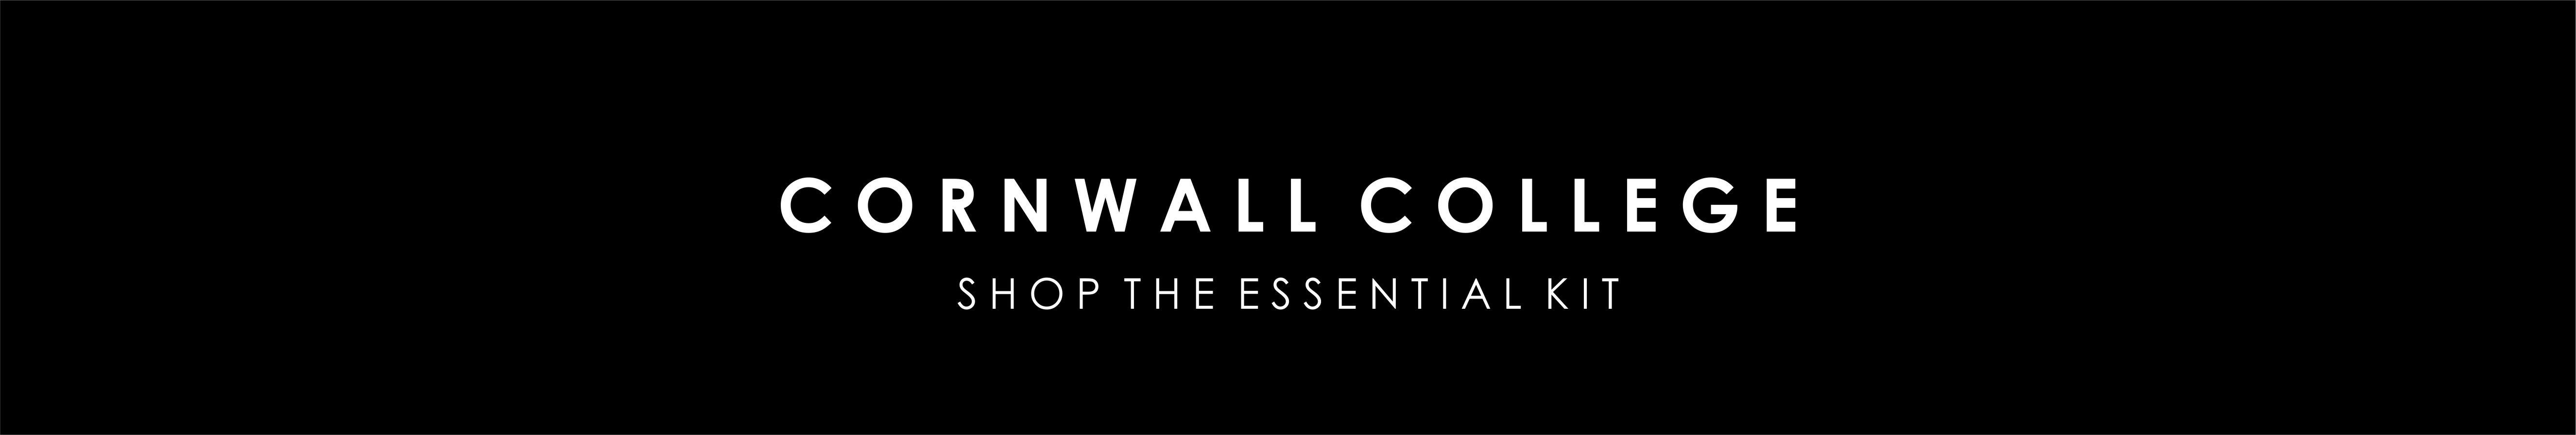 cornwall-college-banner.jpg